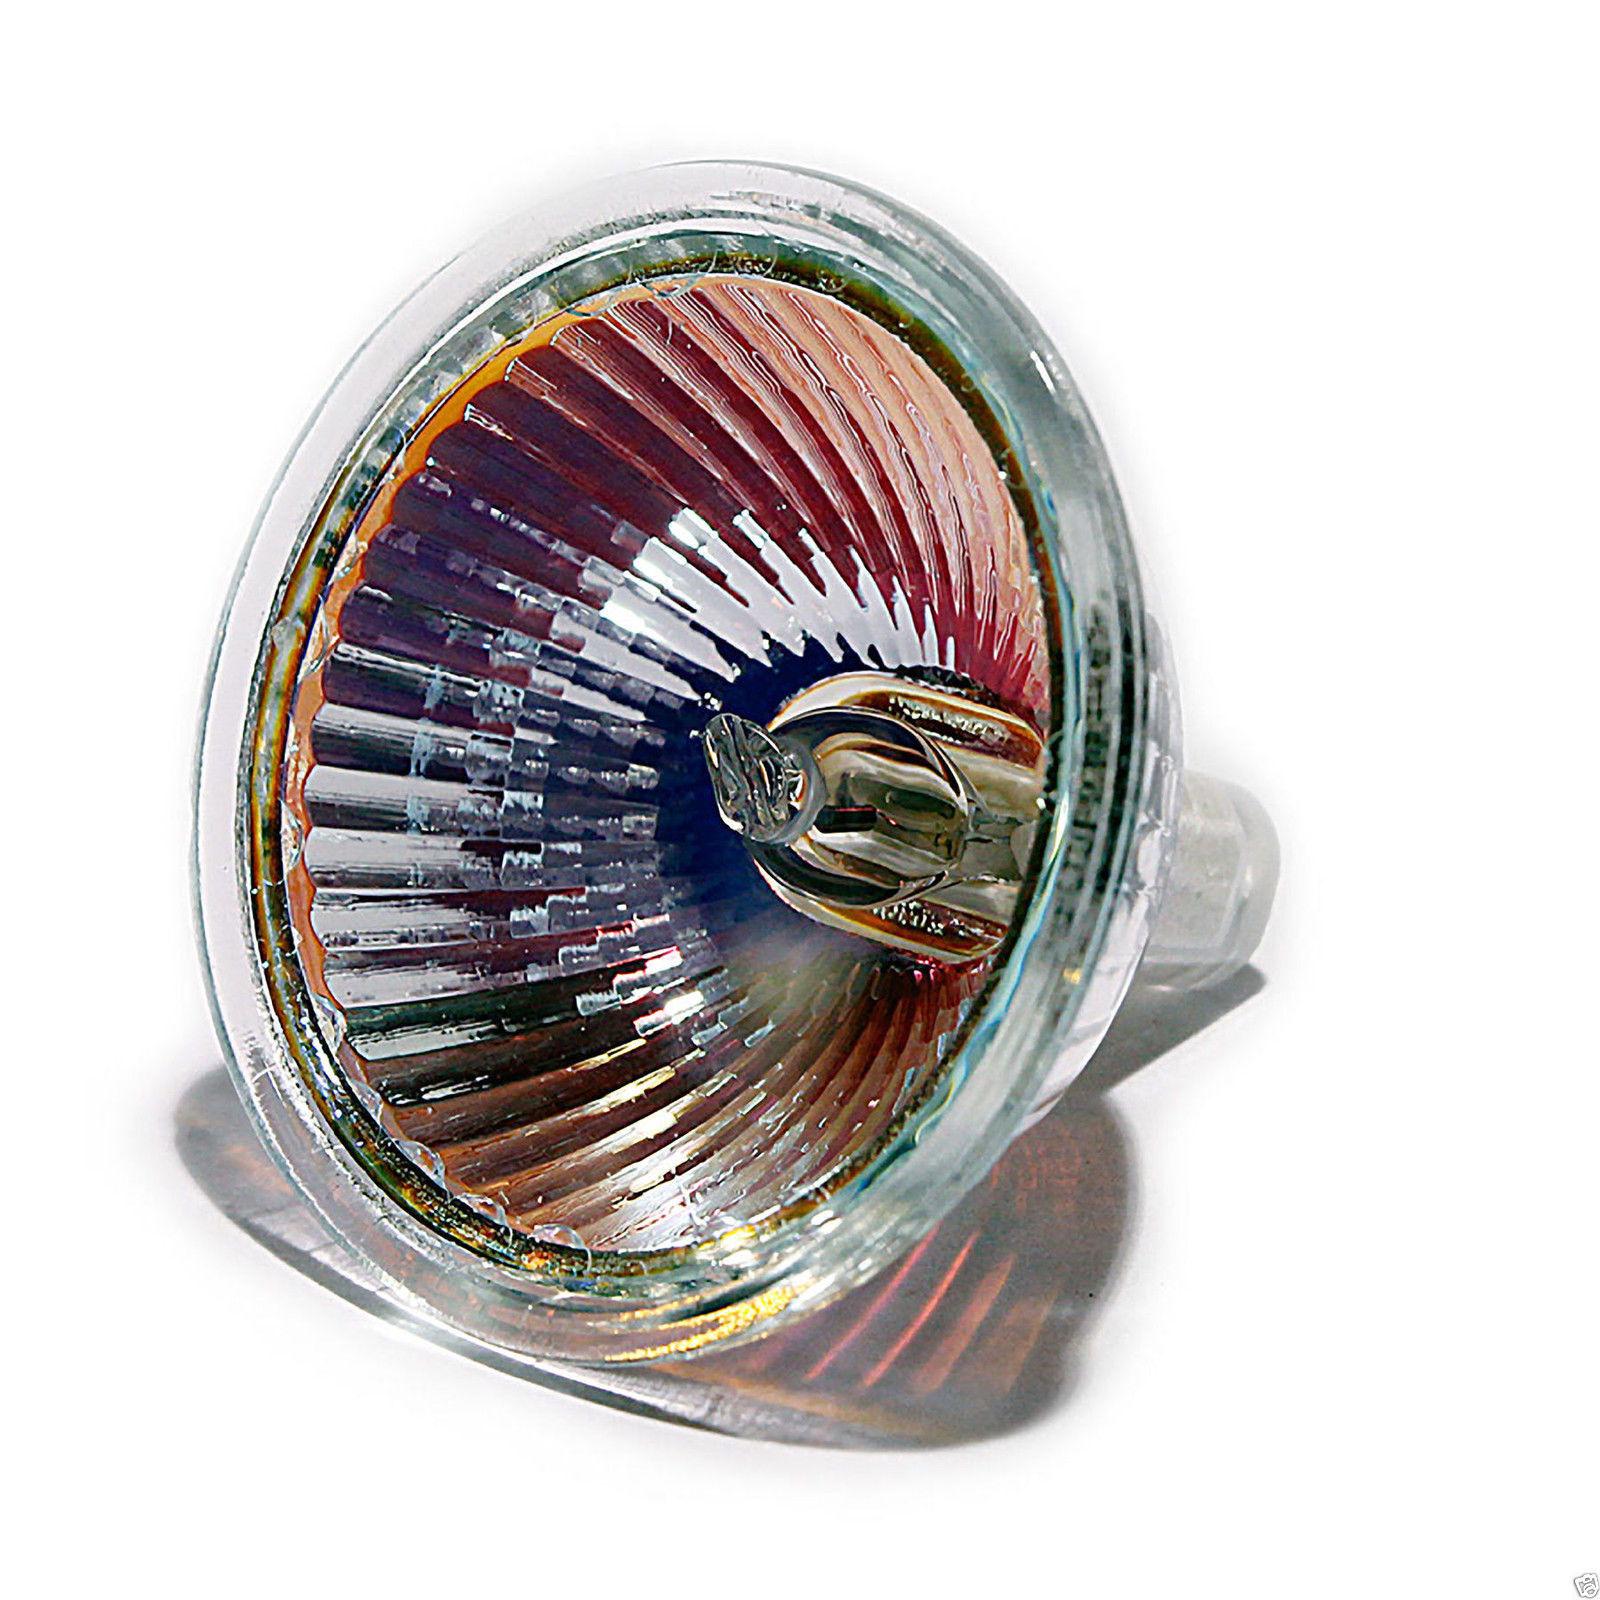 20w//35w//50w MR16 // 10 X osram Dimmbar Decostar 12v Halogen Scheinwerfer Lampe